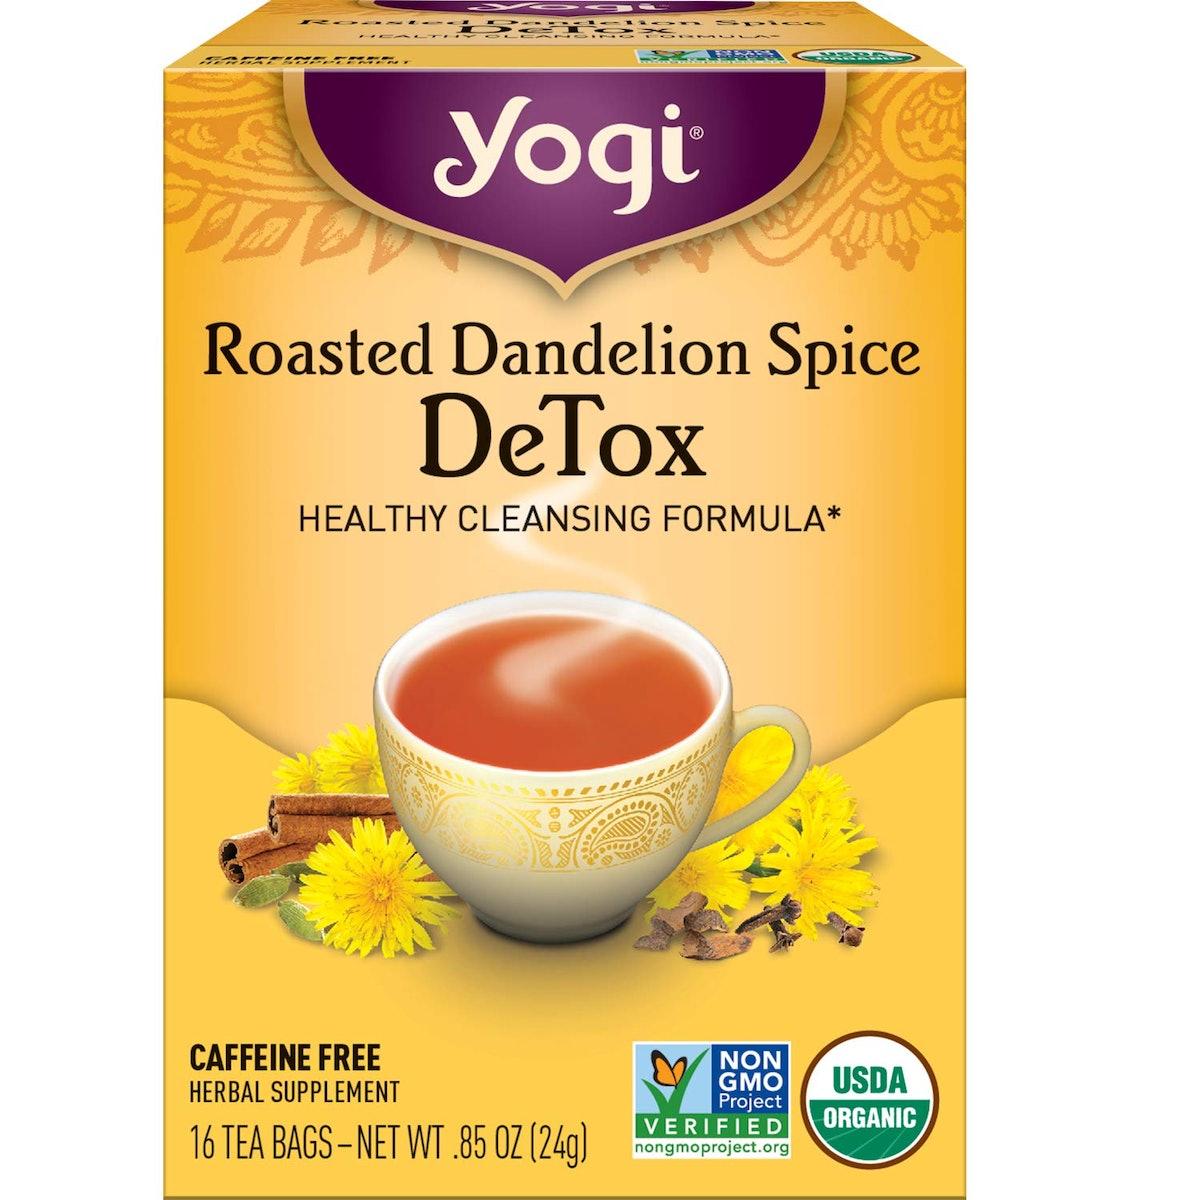 Roasted Dandelion Spice DeTox Tea